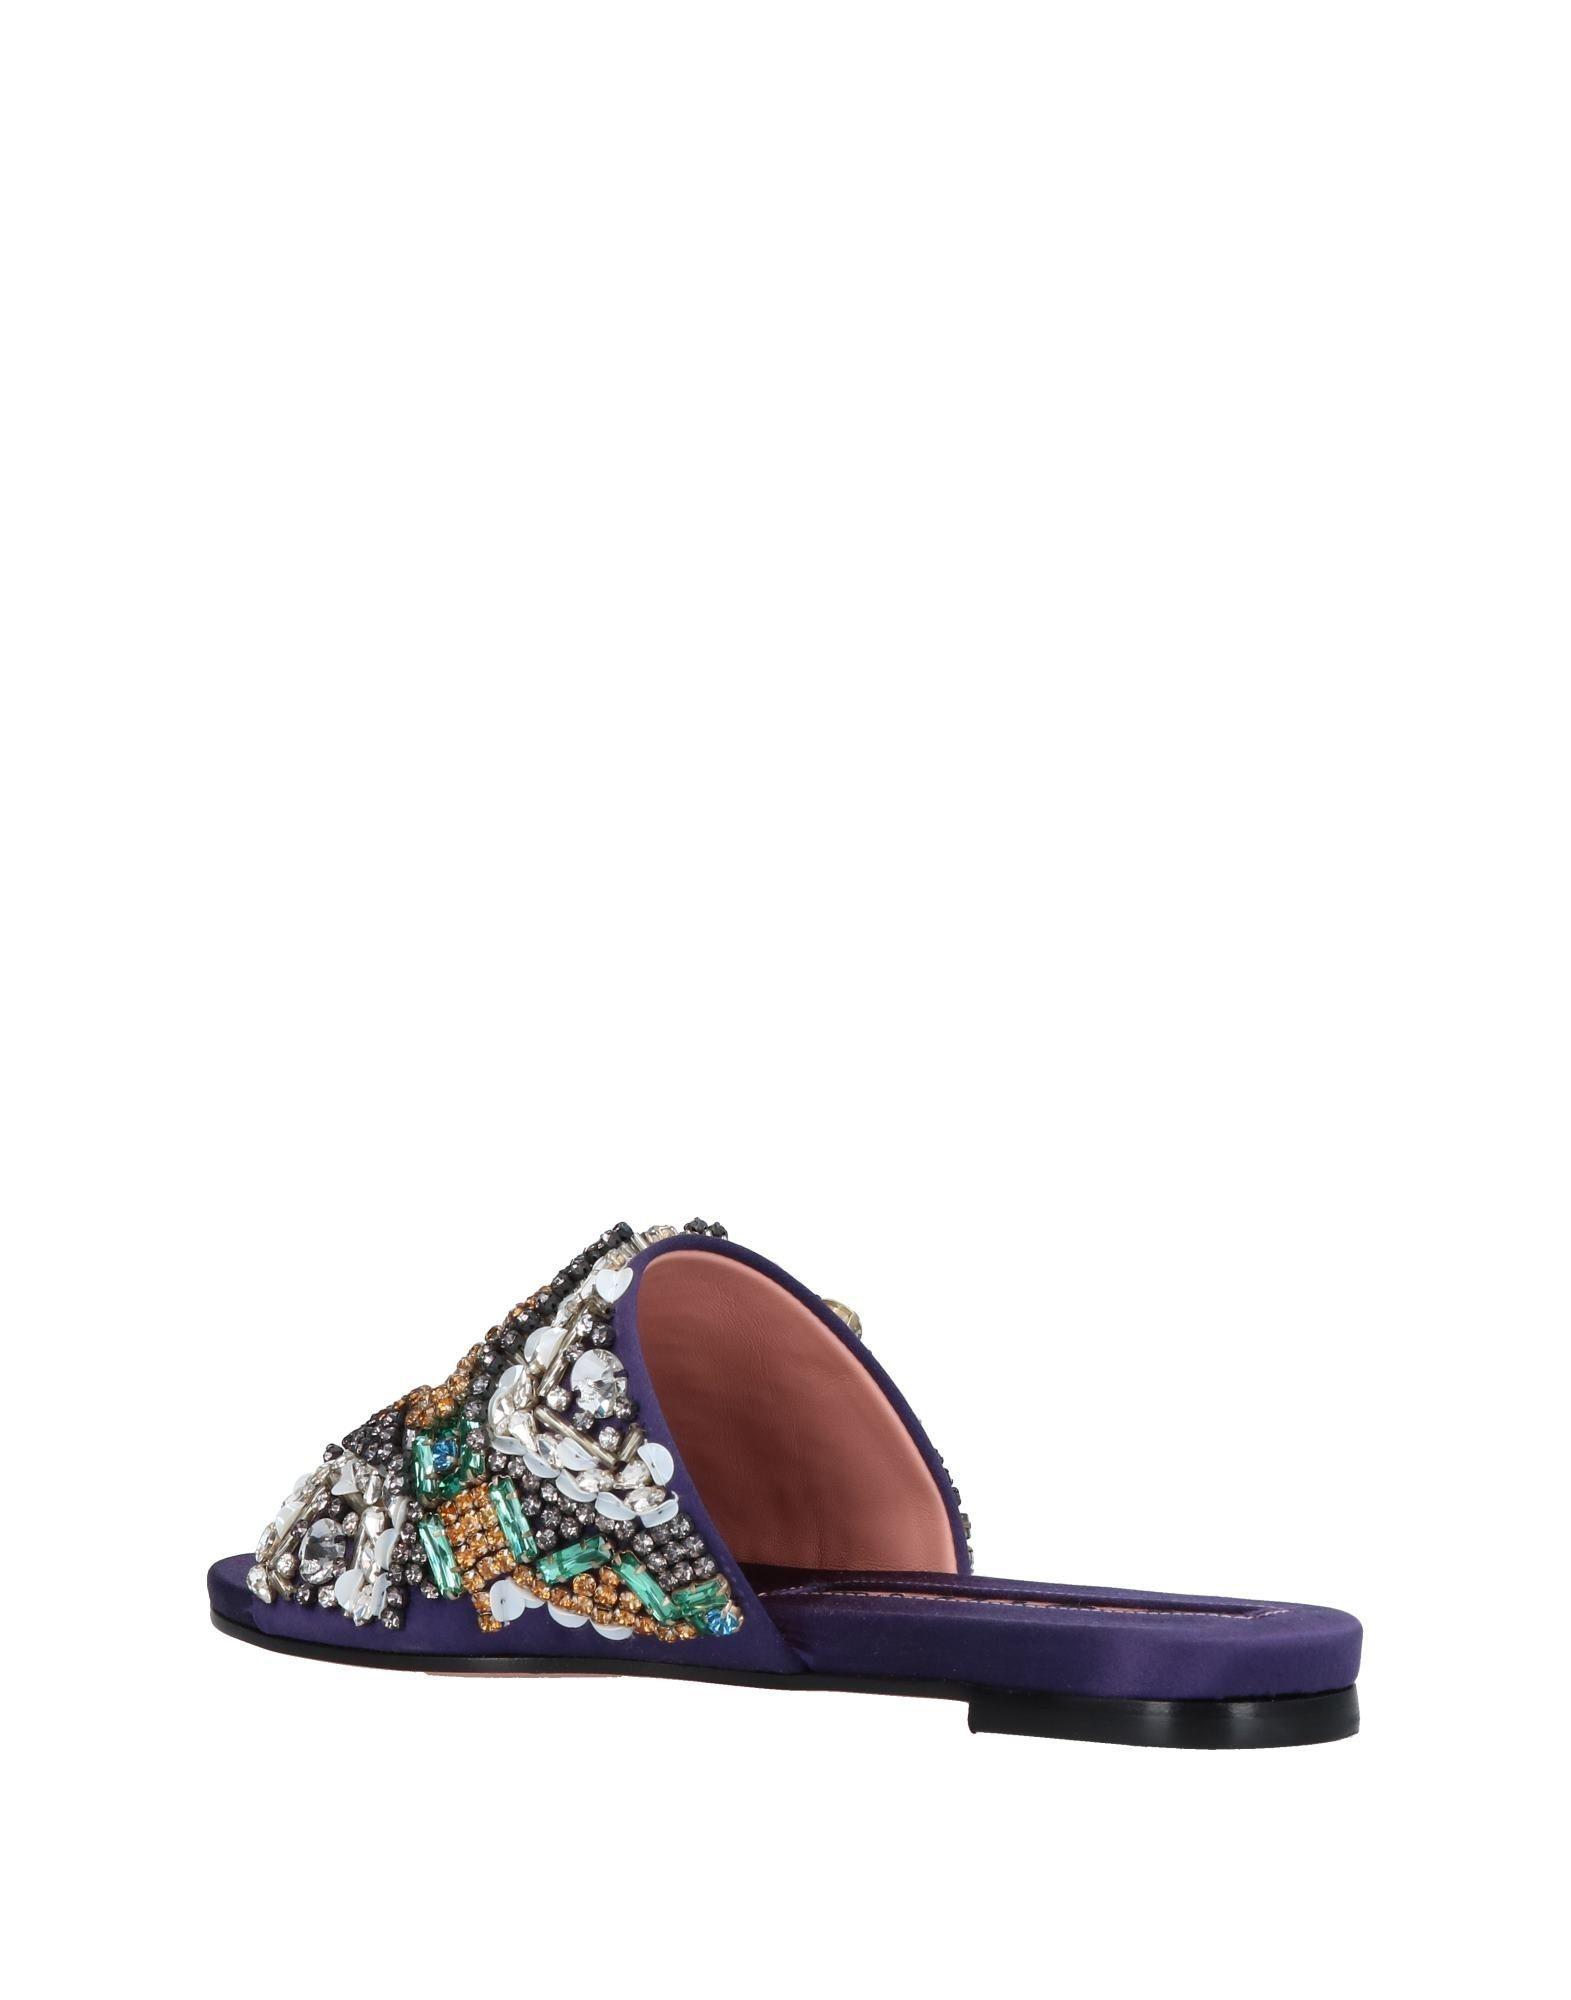 73aaecdf5652 Lyst - Rochas Sandals in Purple